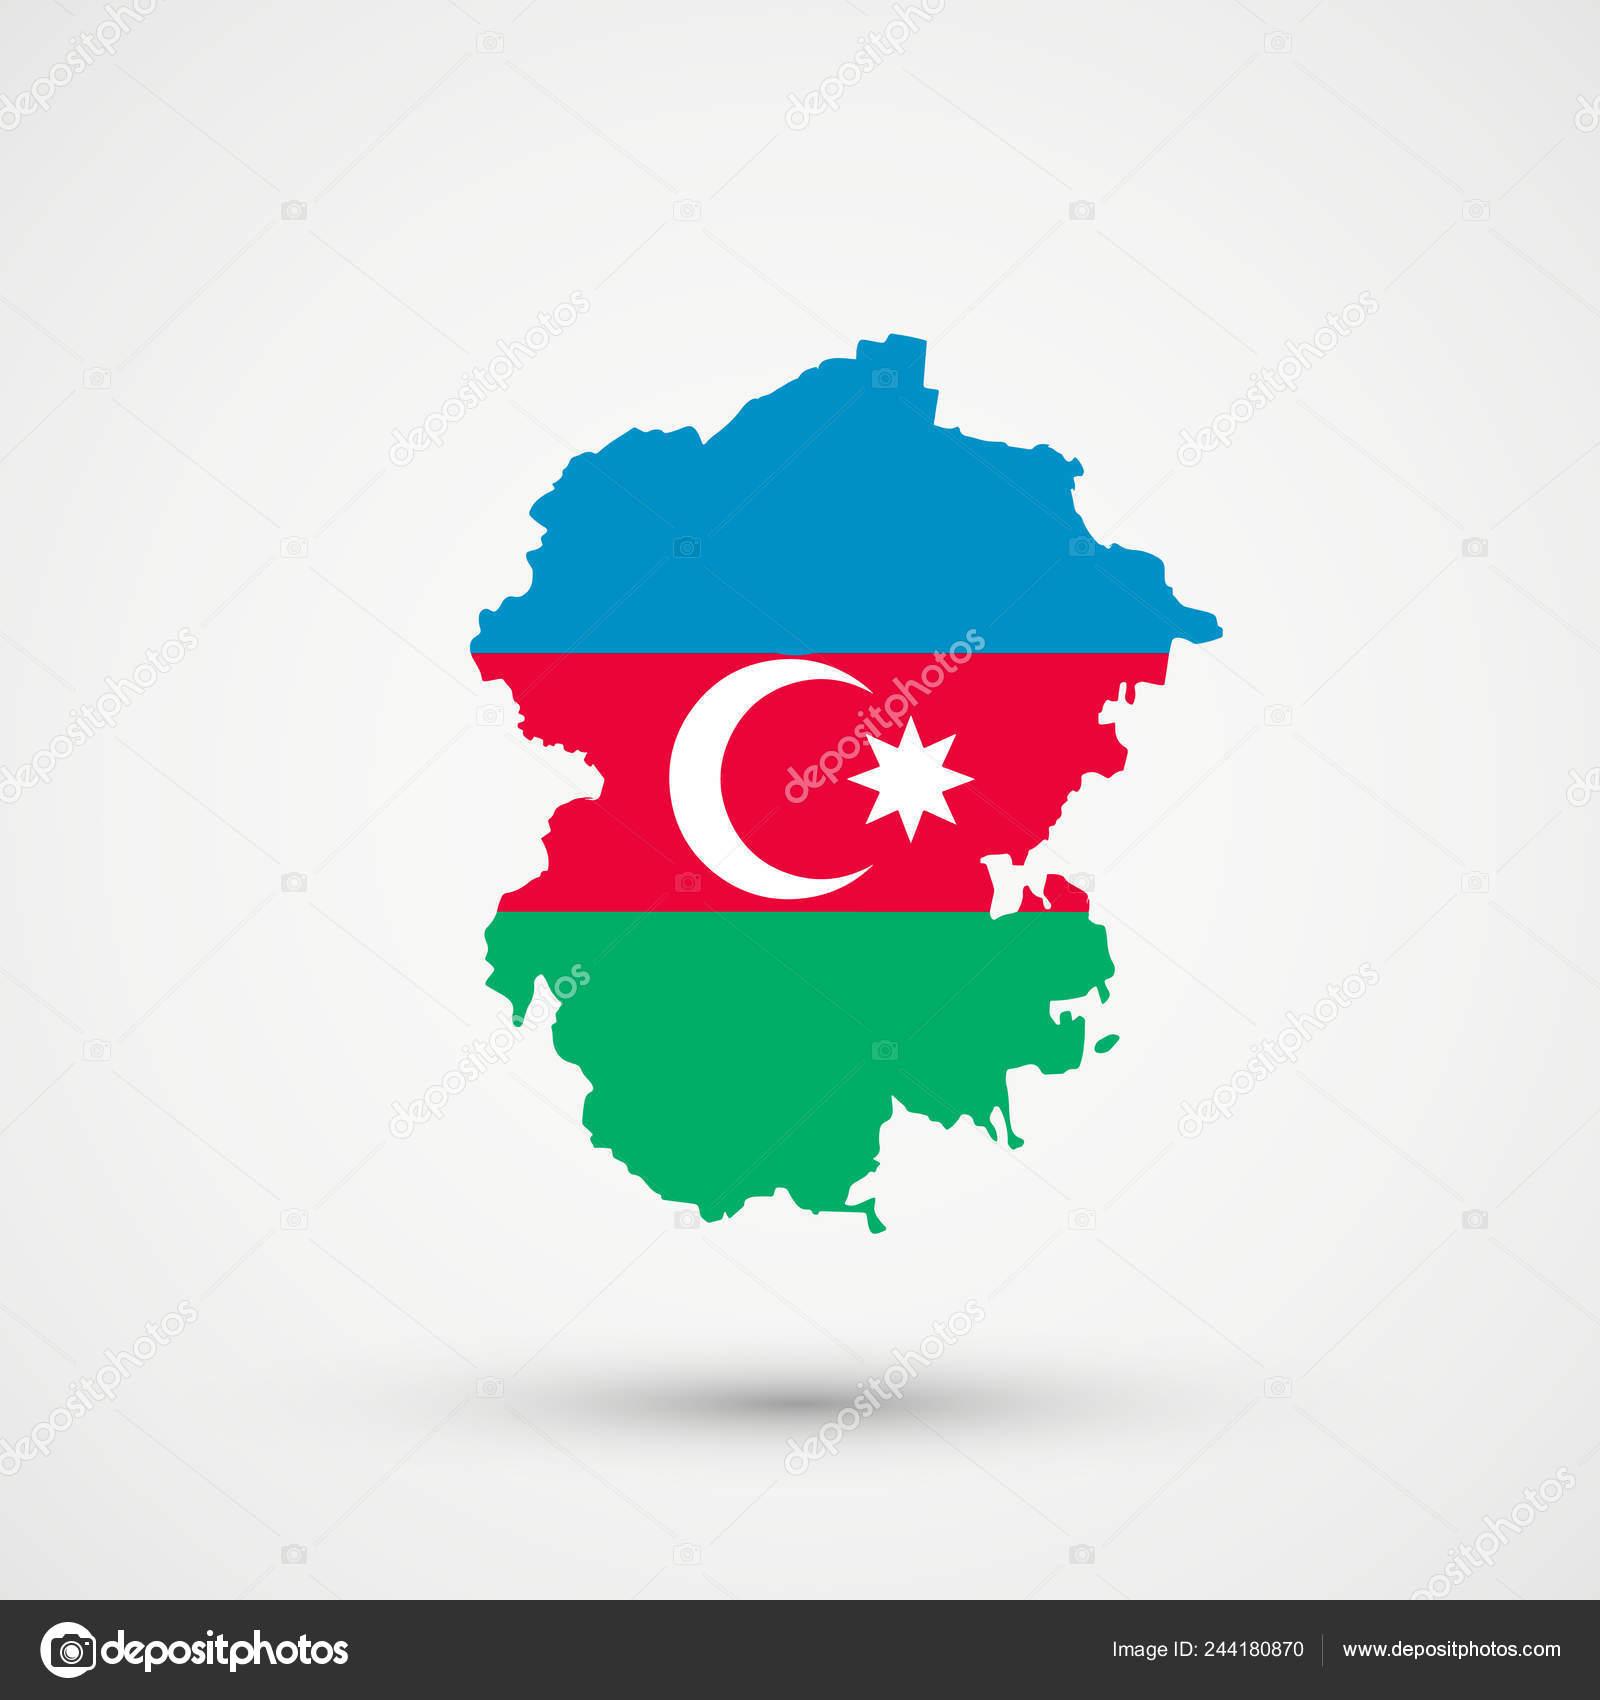 Chuvashia Map Azerbaijan Flag Colors Editable Vector Stock Vector C L8l 244180870